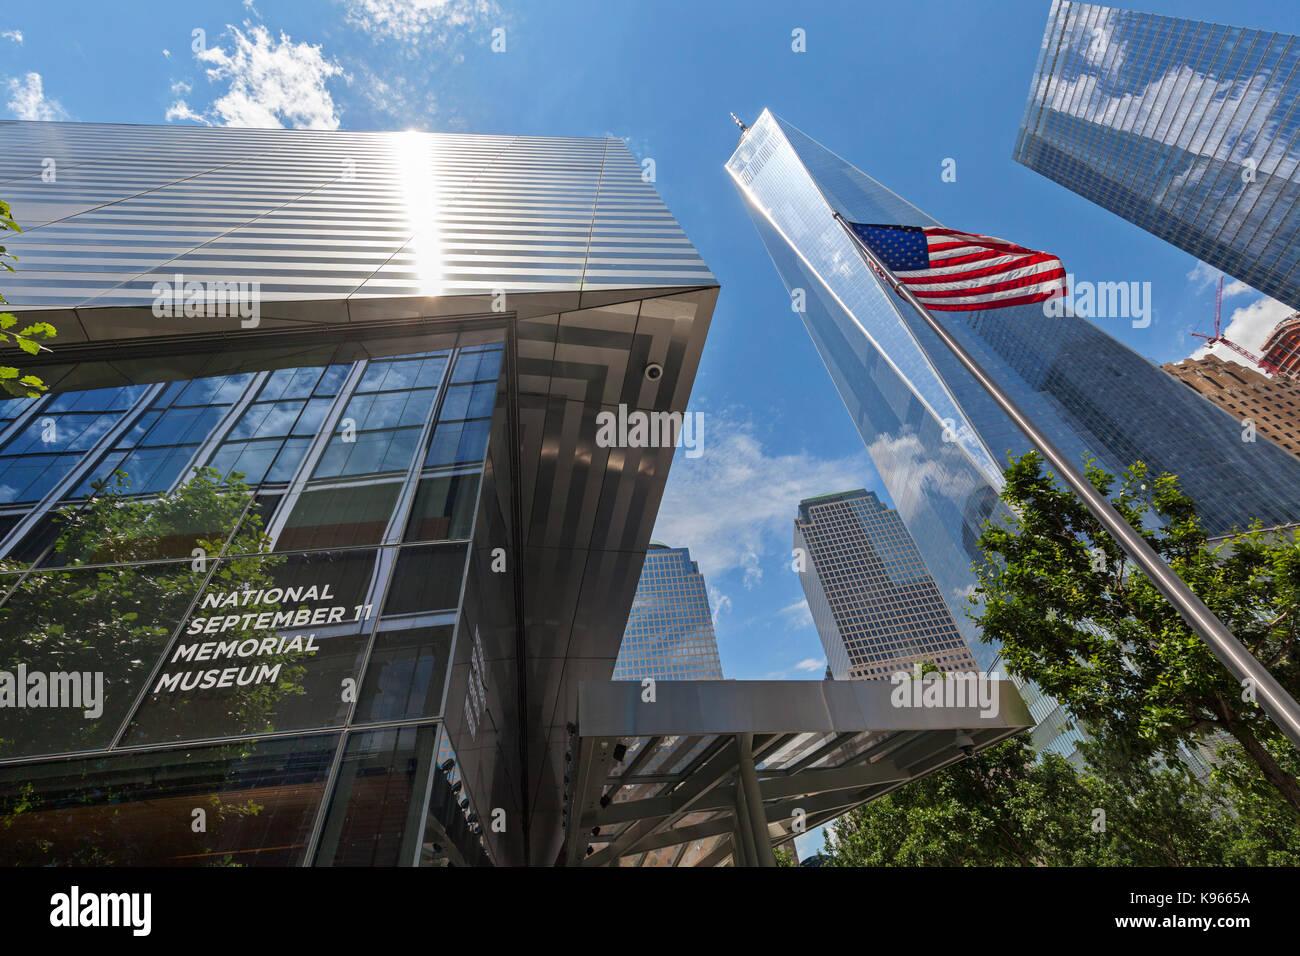 The National September 11 Memorial Museum near the Freedom Tower, Manhattan, New York. Stock Photo